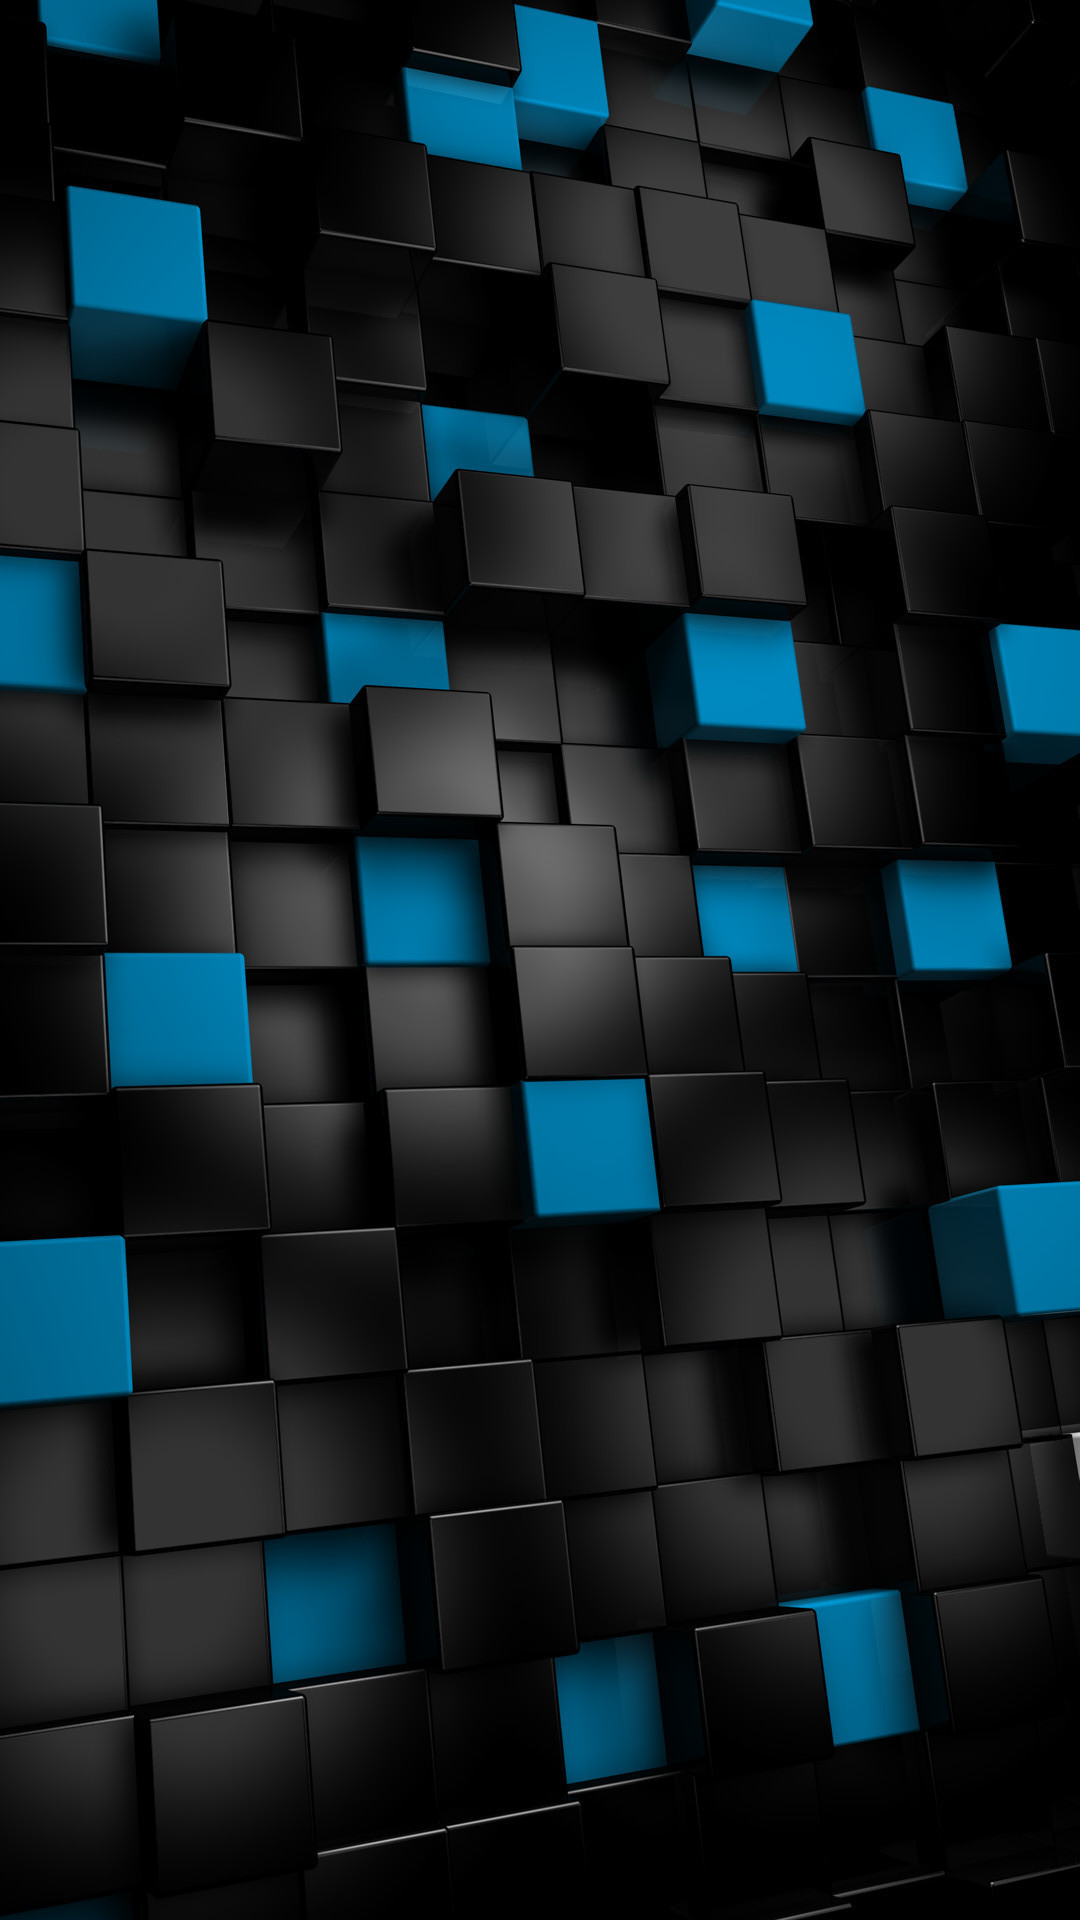 Windows 8 Lock Screen Wallpapers (74+ images)